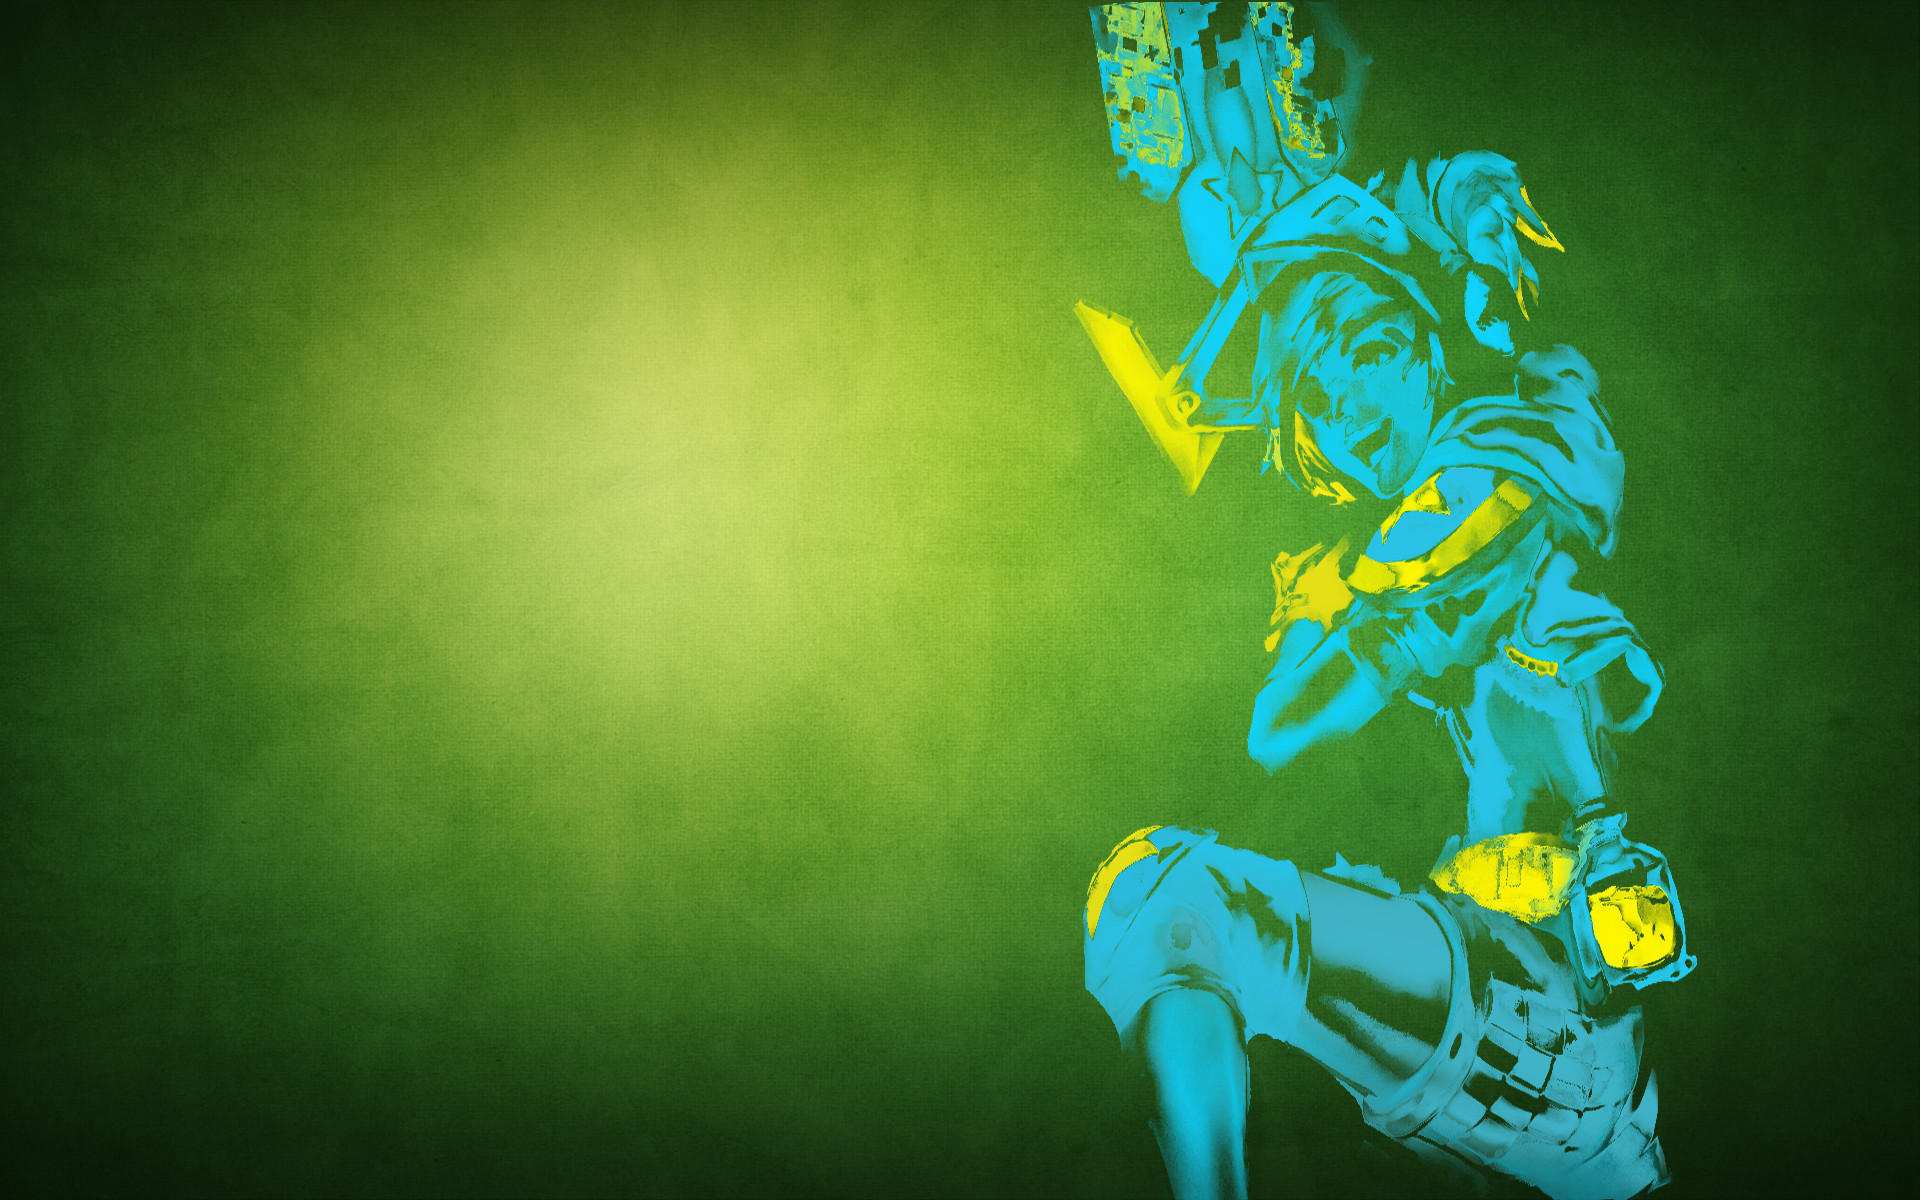 Video Game – League Of Legends Riven (League Of Legends) Wallpaper